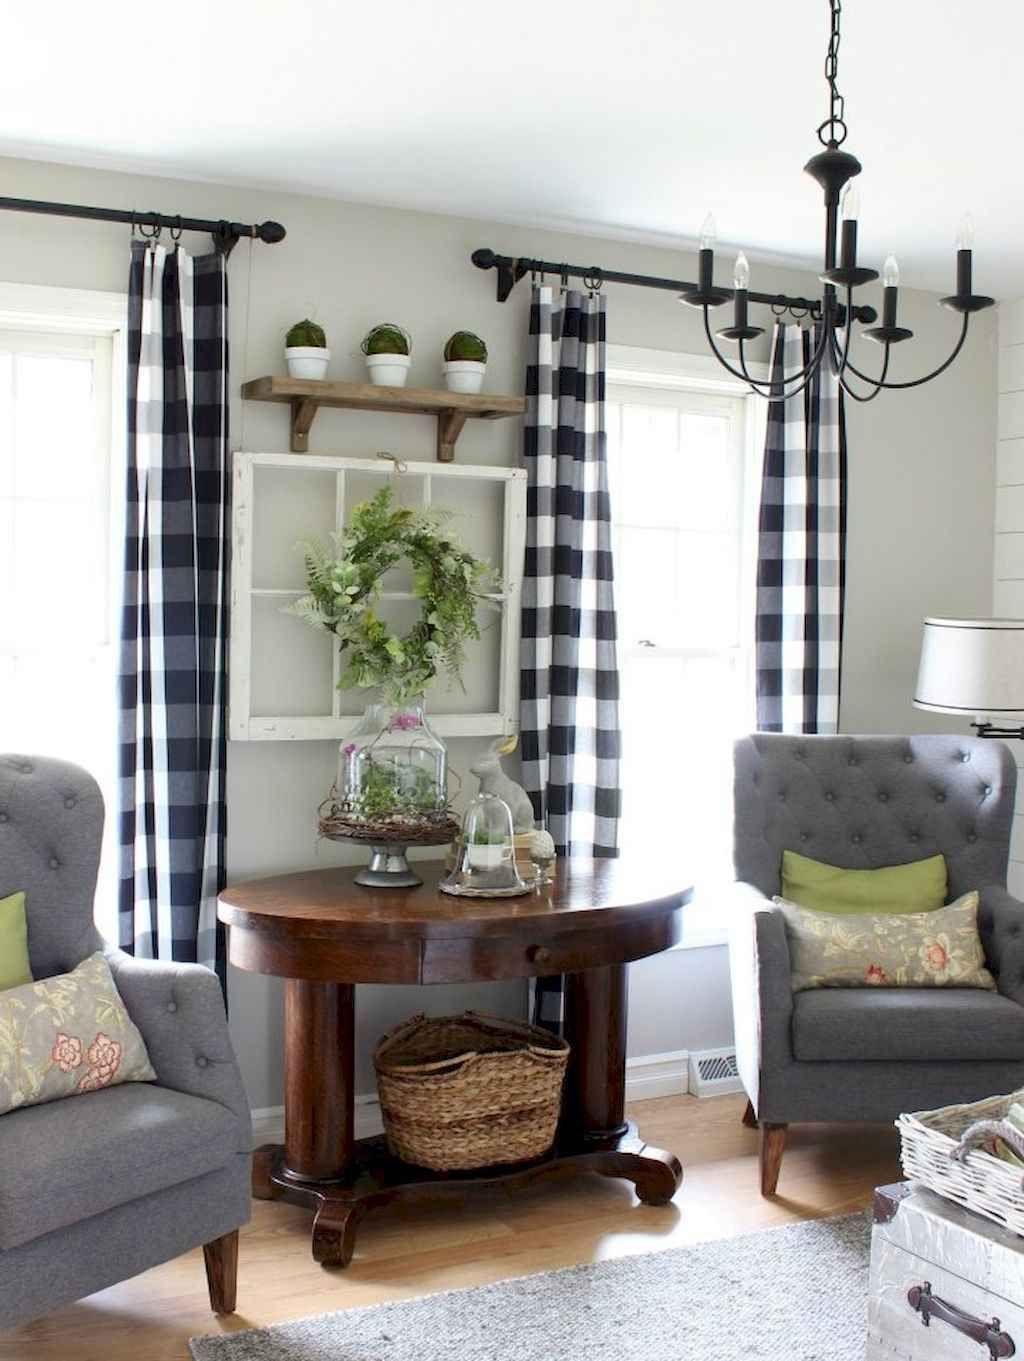 22 cheap farmhouse curtains ideas decoration page 22 of